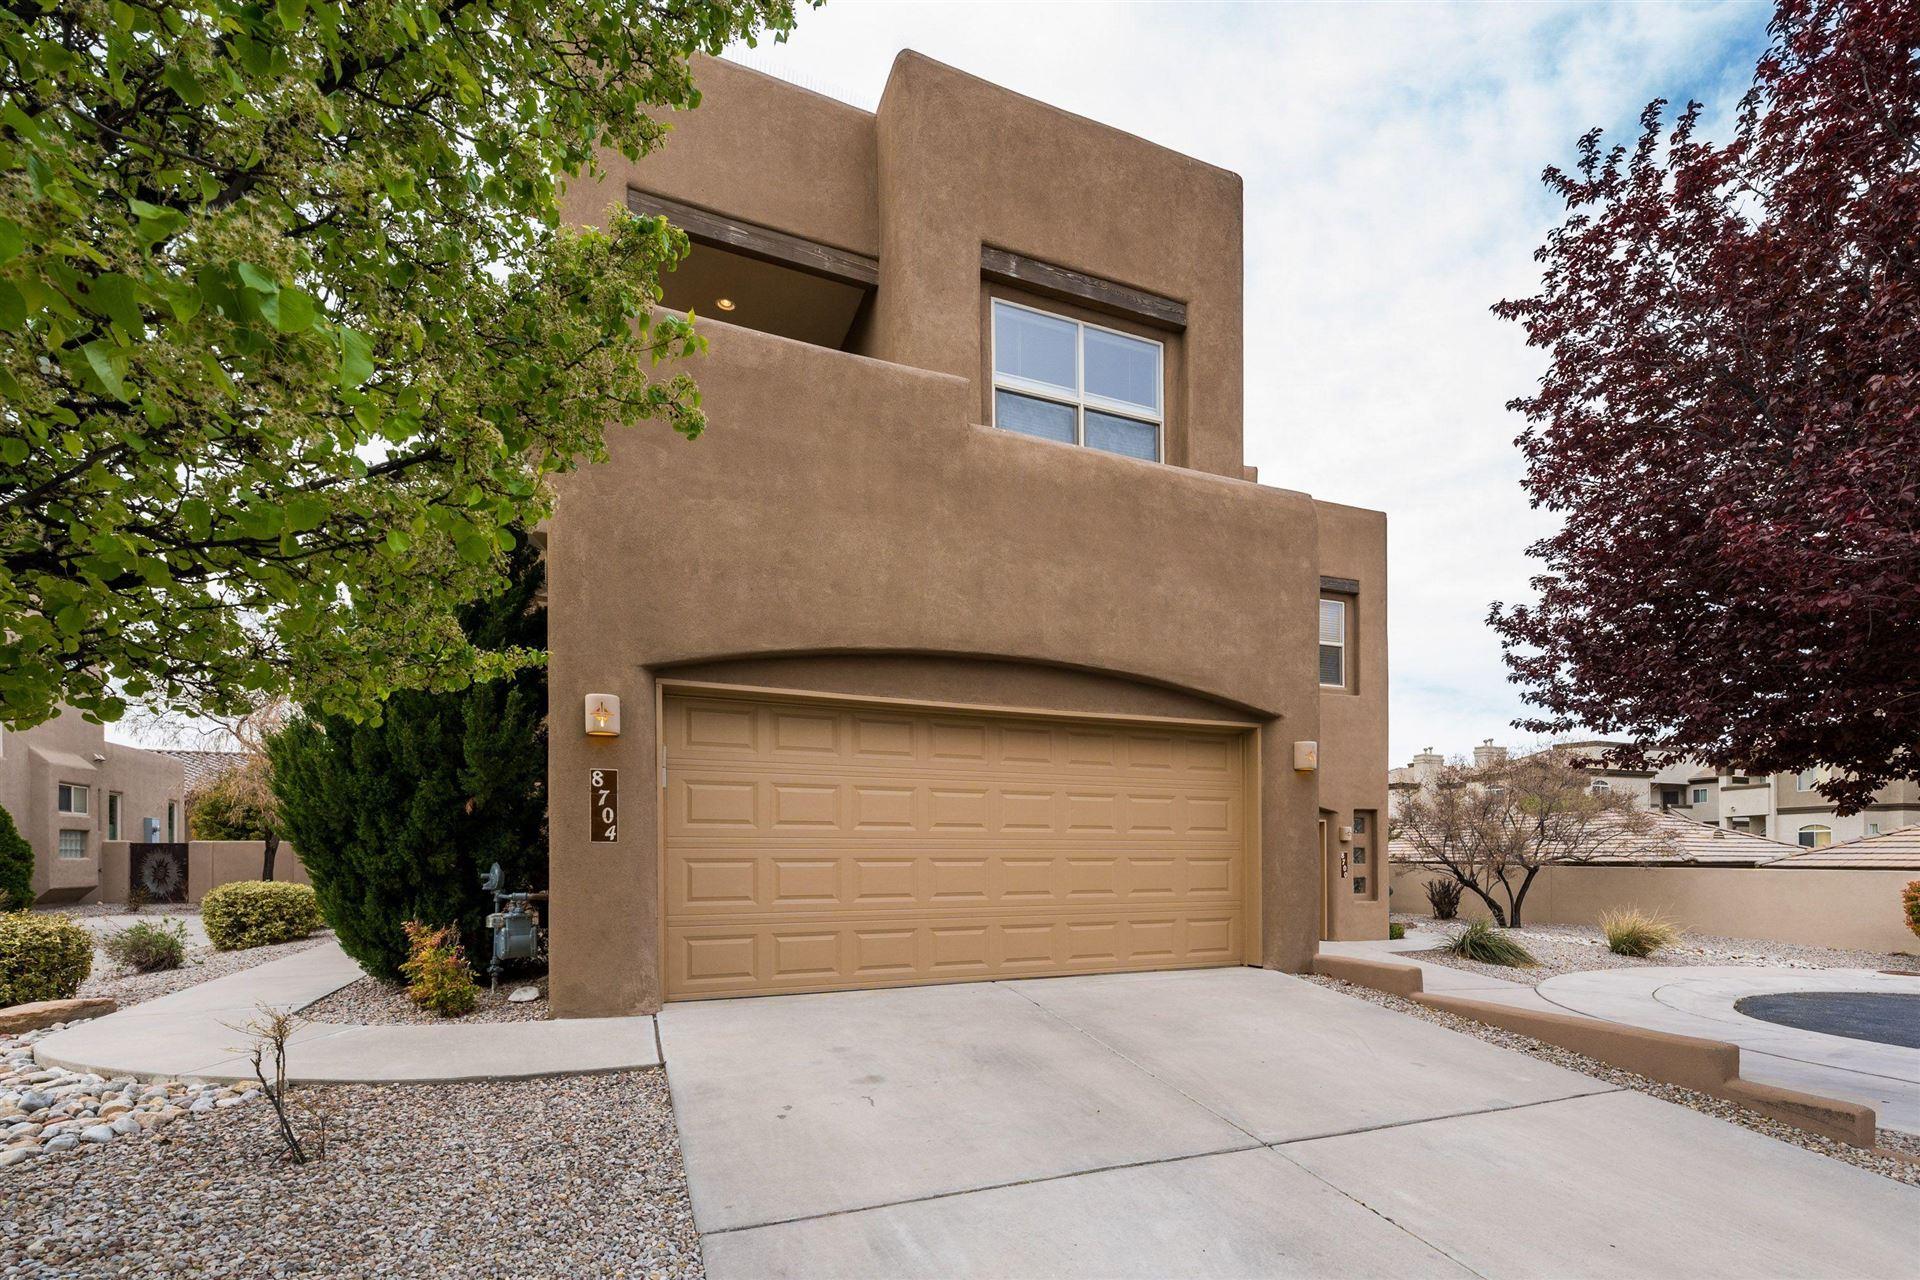 Photo of 8704 Desert Fox Way NE, Albuquerque, NM 87122 (MLS # 989935)